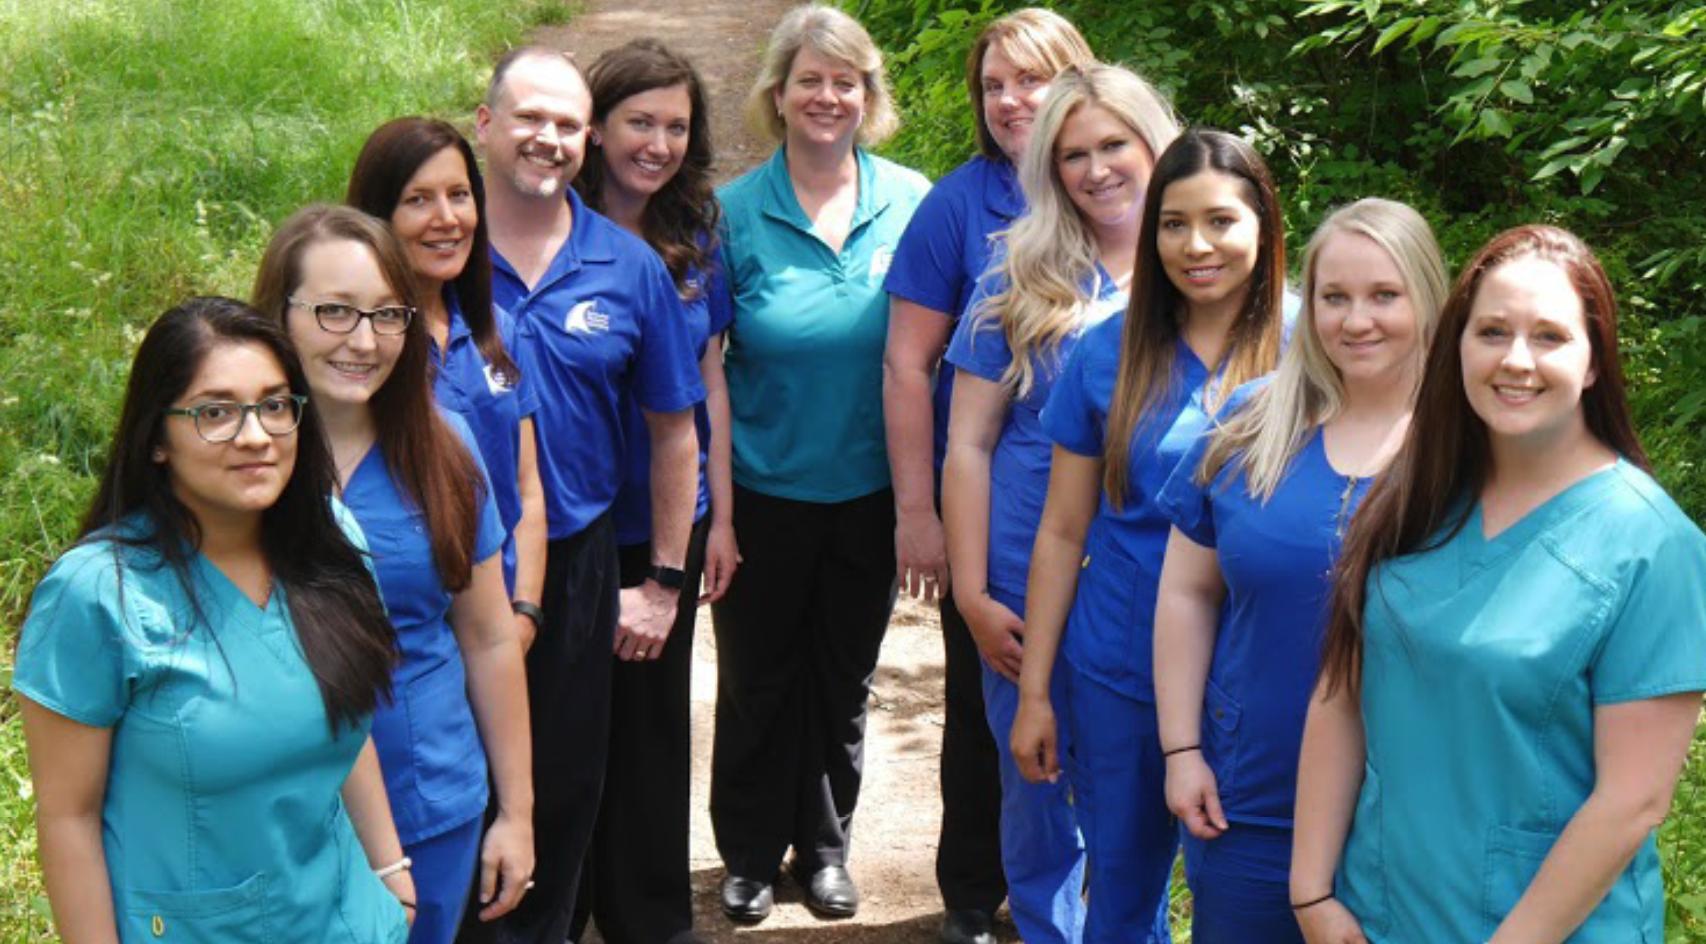 The Staff at Spinnaker Pediatric Dentistry